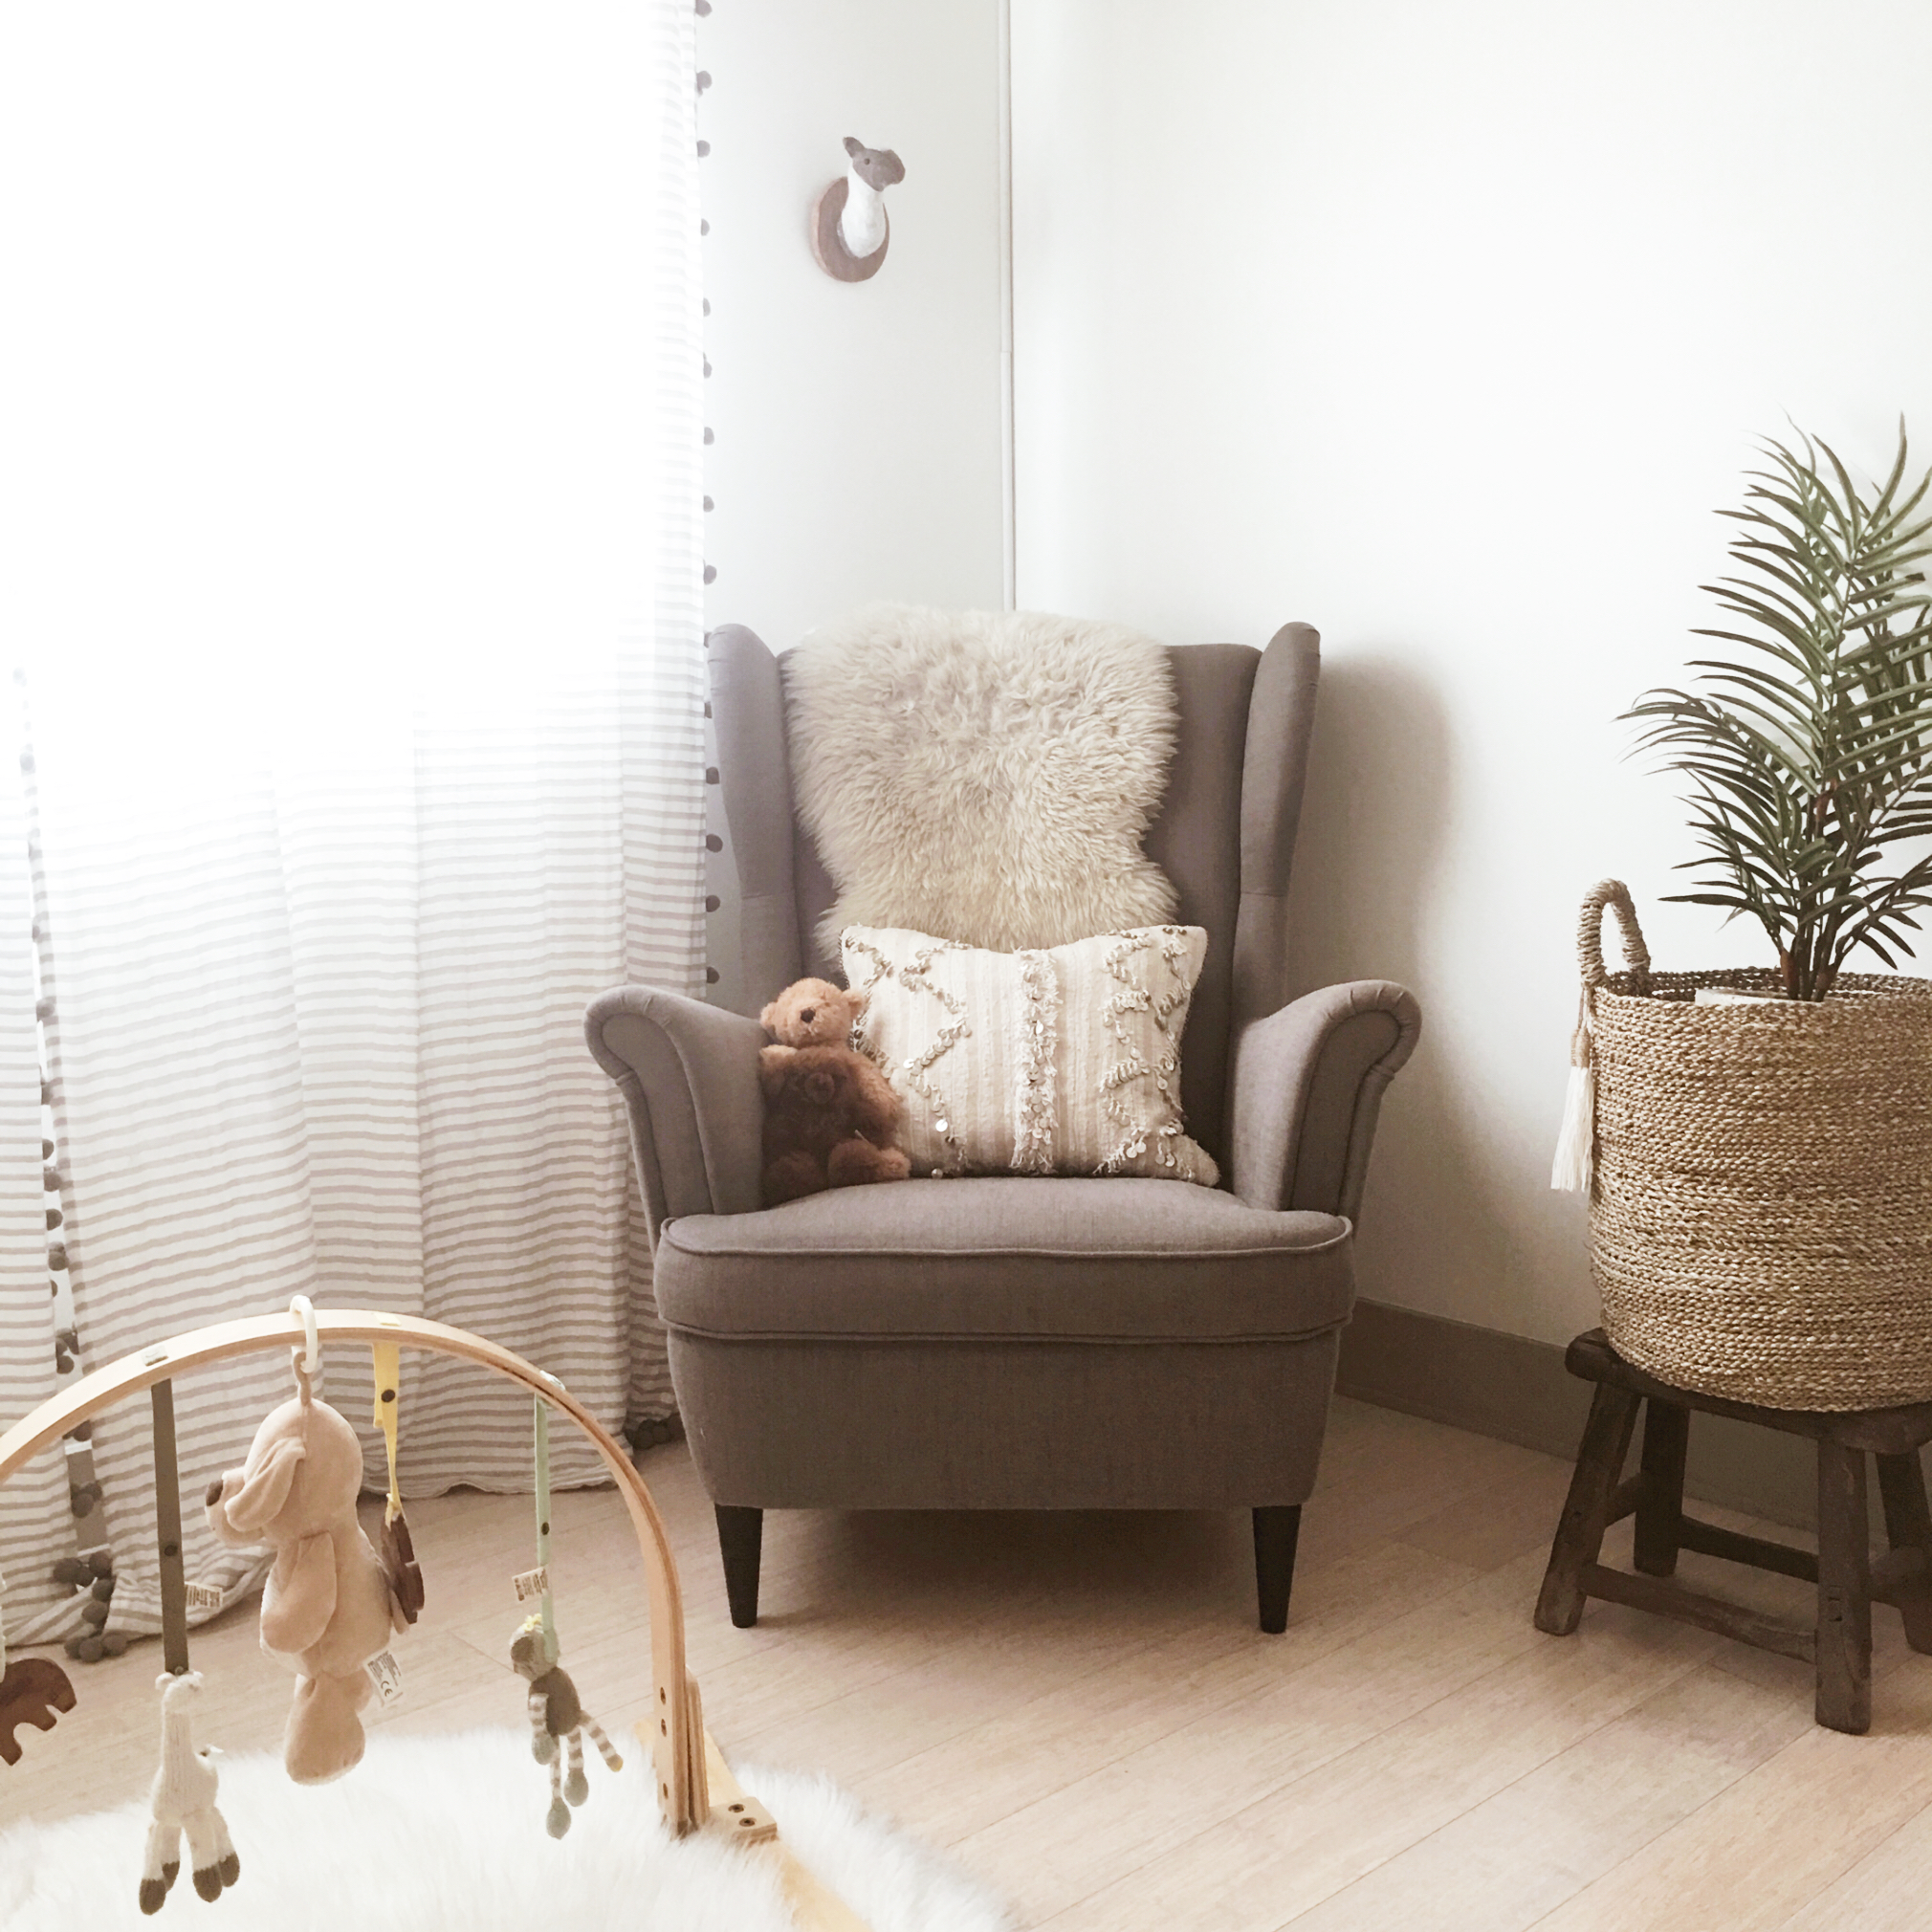 pops nursery, the modhemian, neutral boho nursery decor